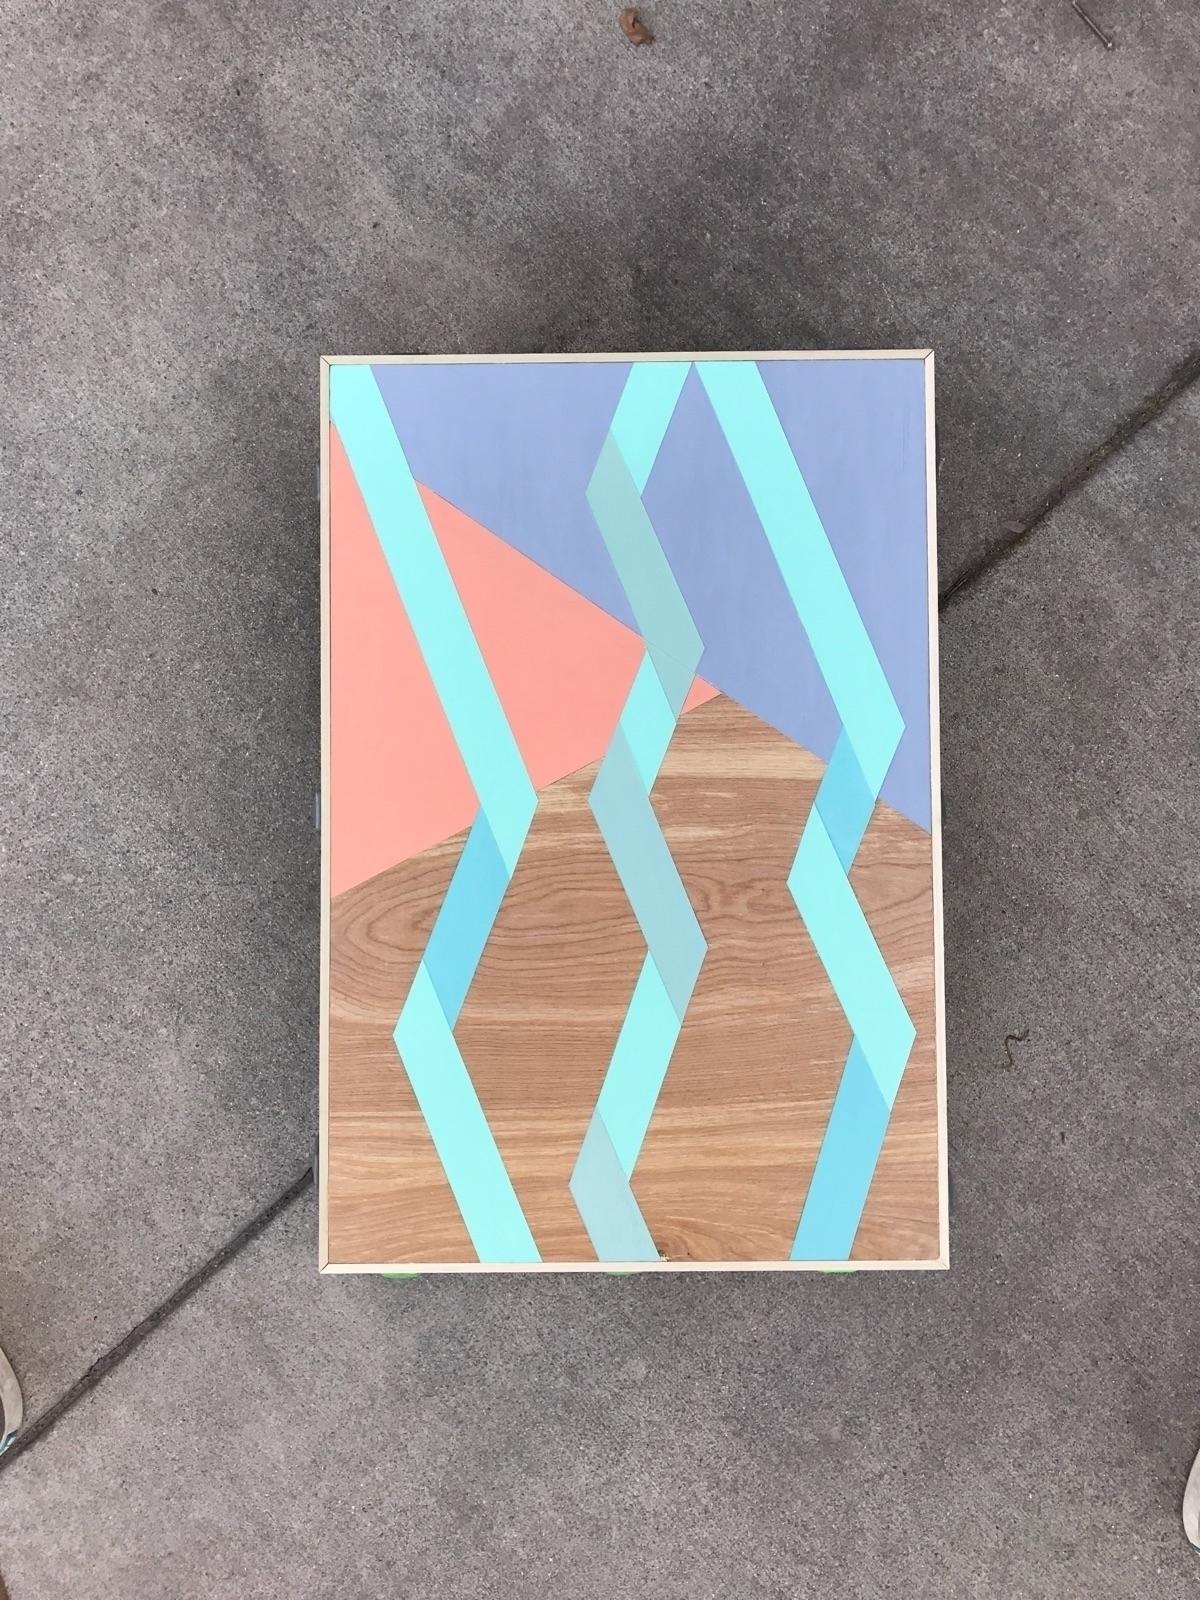 acryliconpanel, painting - matt_shurtleff | ello